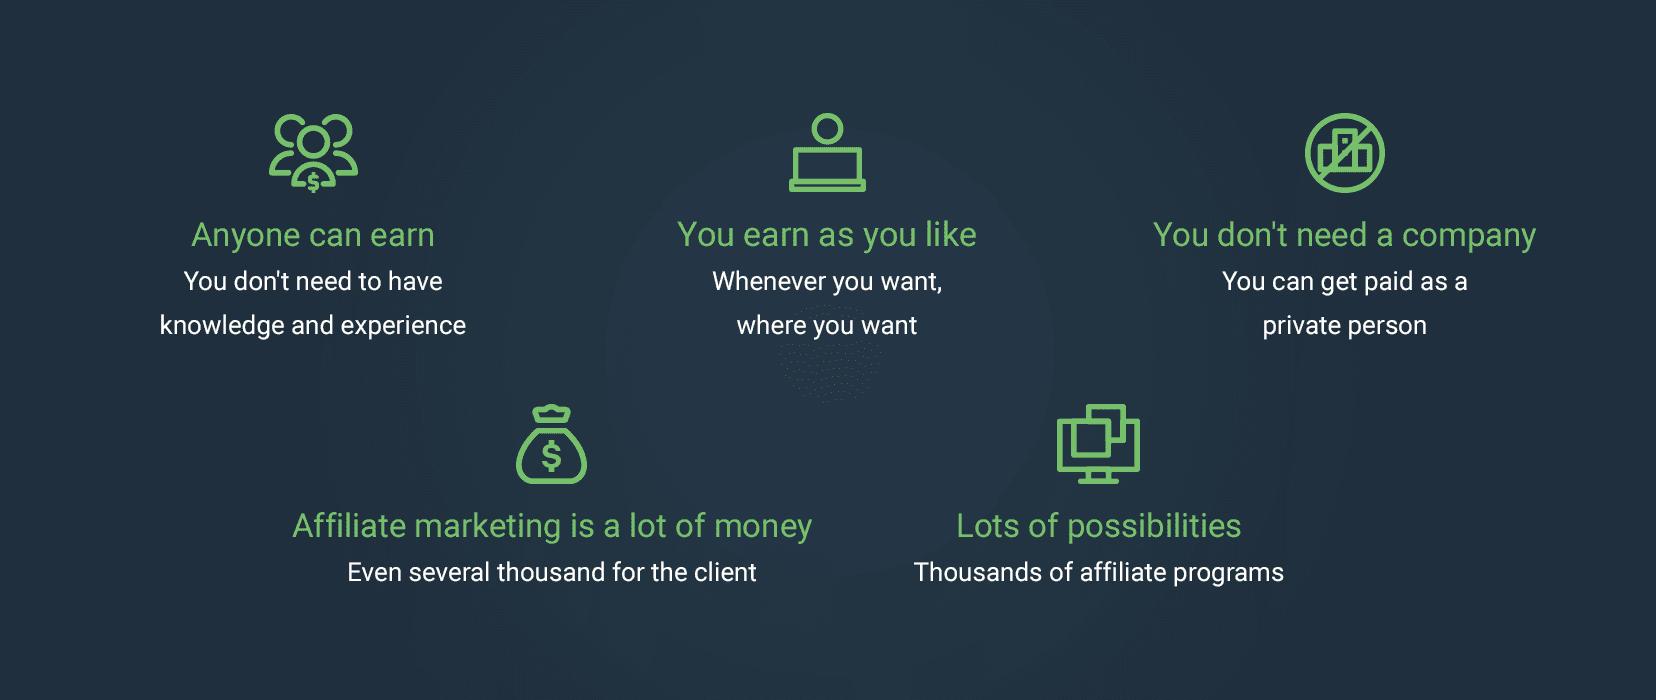 Advantages of affiliate marketing